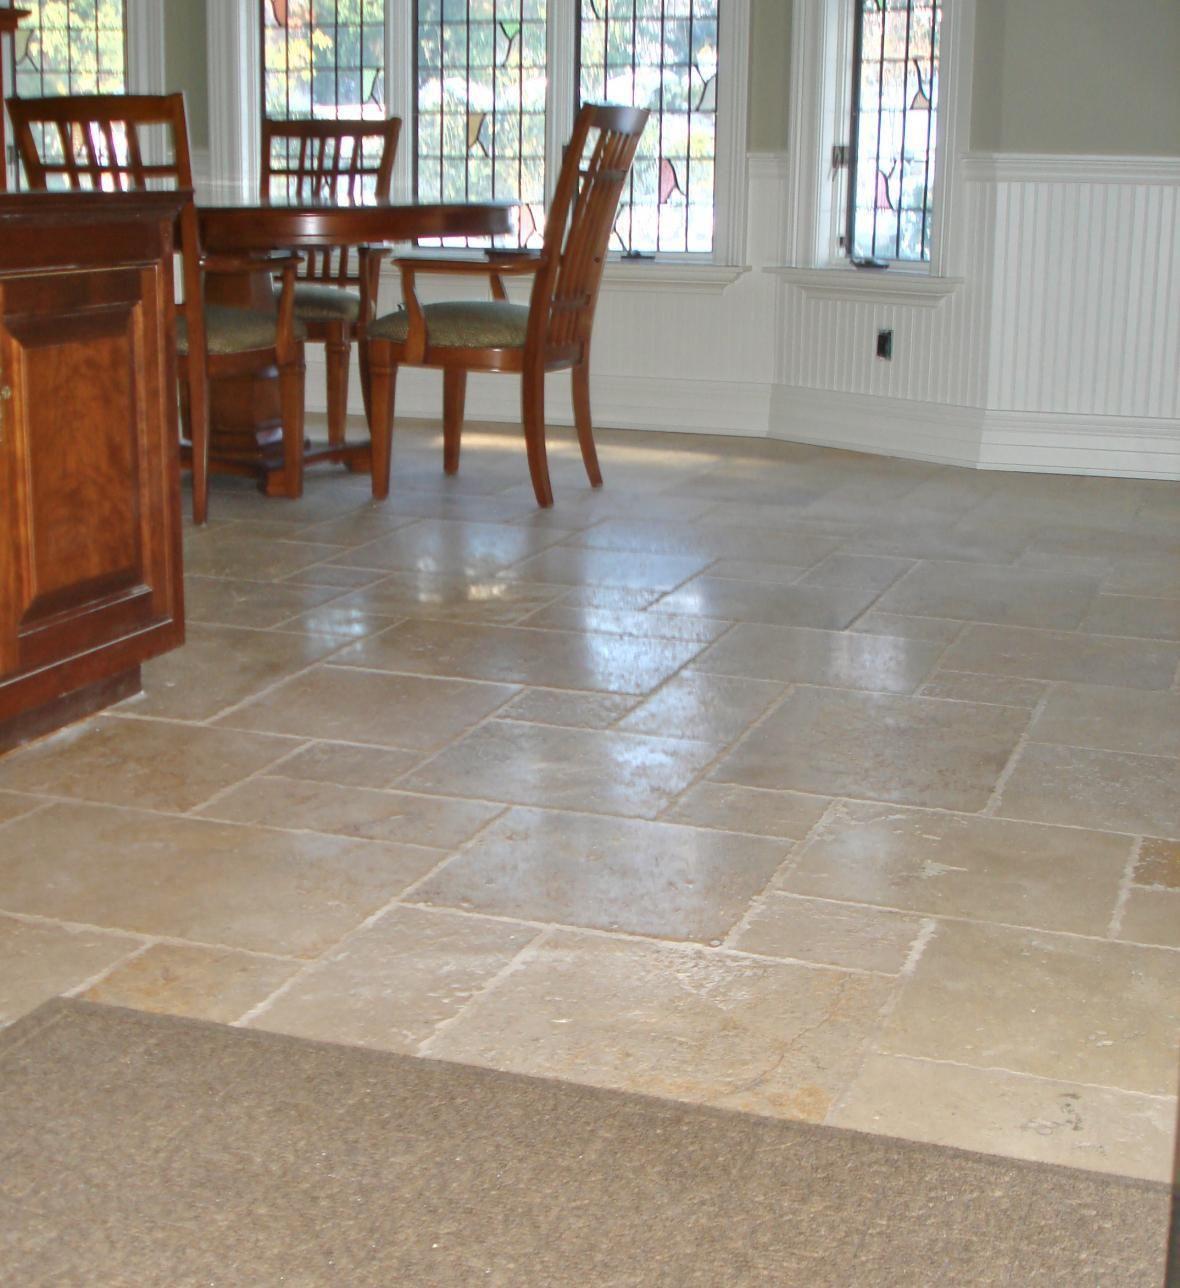 Tumbled Marble Kitchen Tumbled Marble Kitchen Tile Floor Tiles Stylish  Floor Tiles Design Modern Kitchen Floors